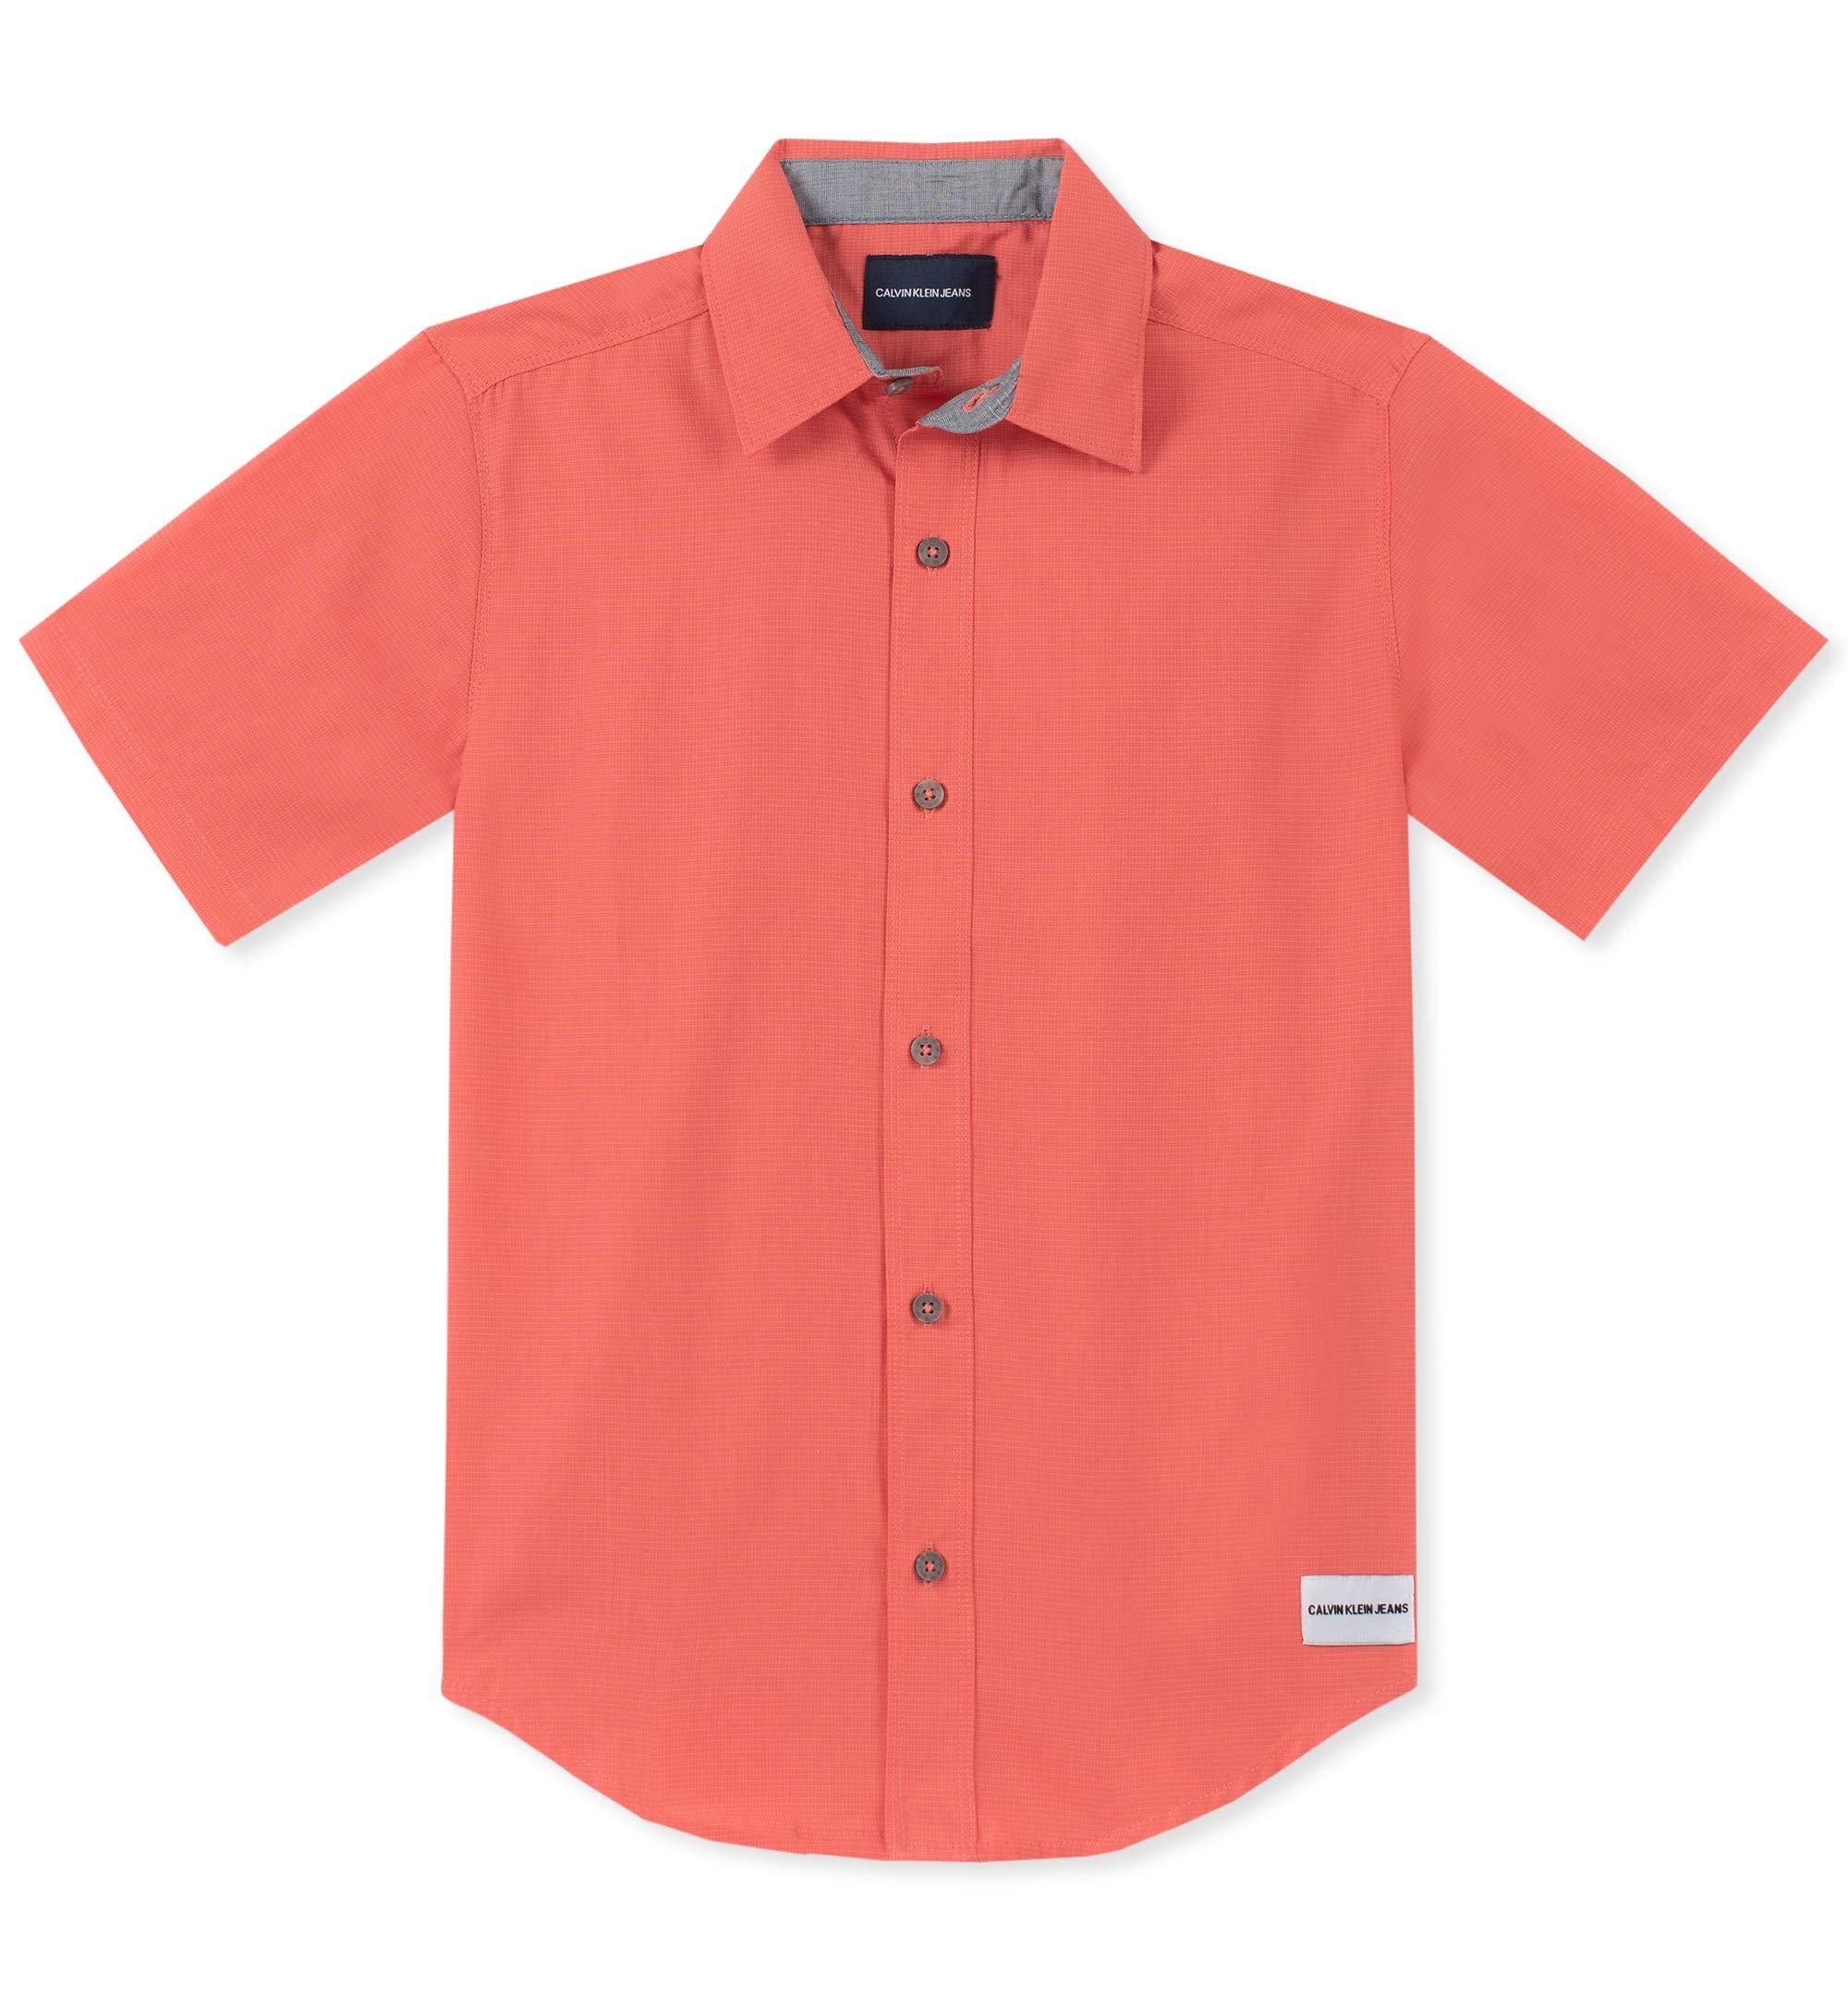 Calvin Klein Boys' Big Horizontal Chambray Short Sleeve Shirt, Coral, Medium (10/12)